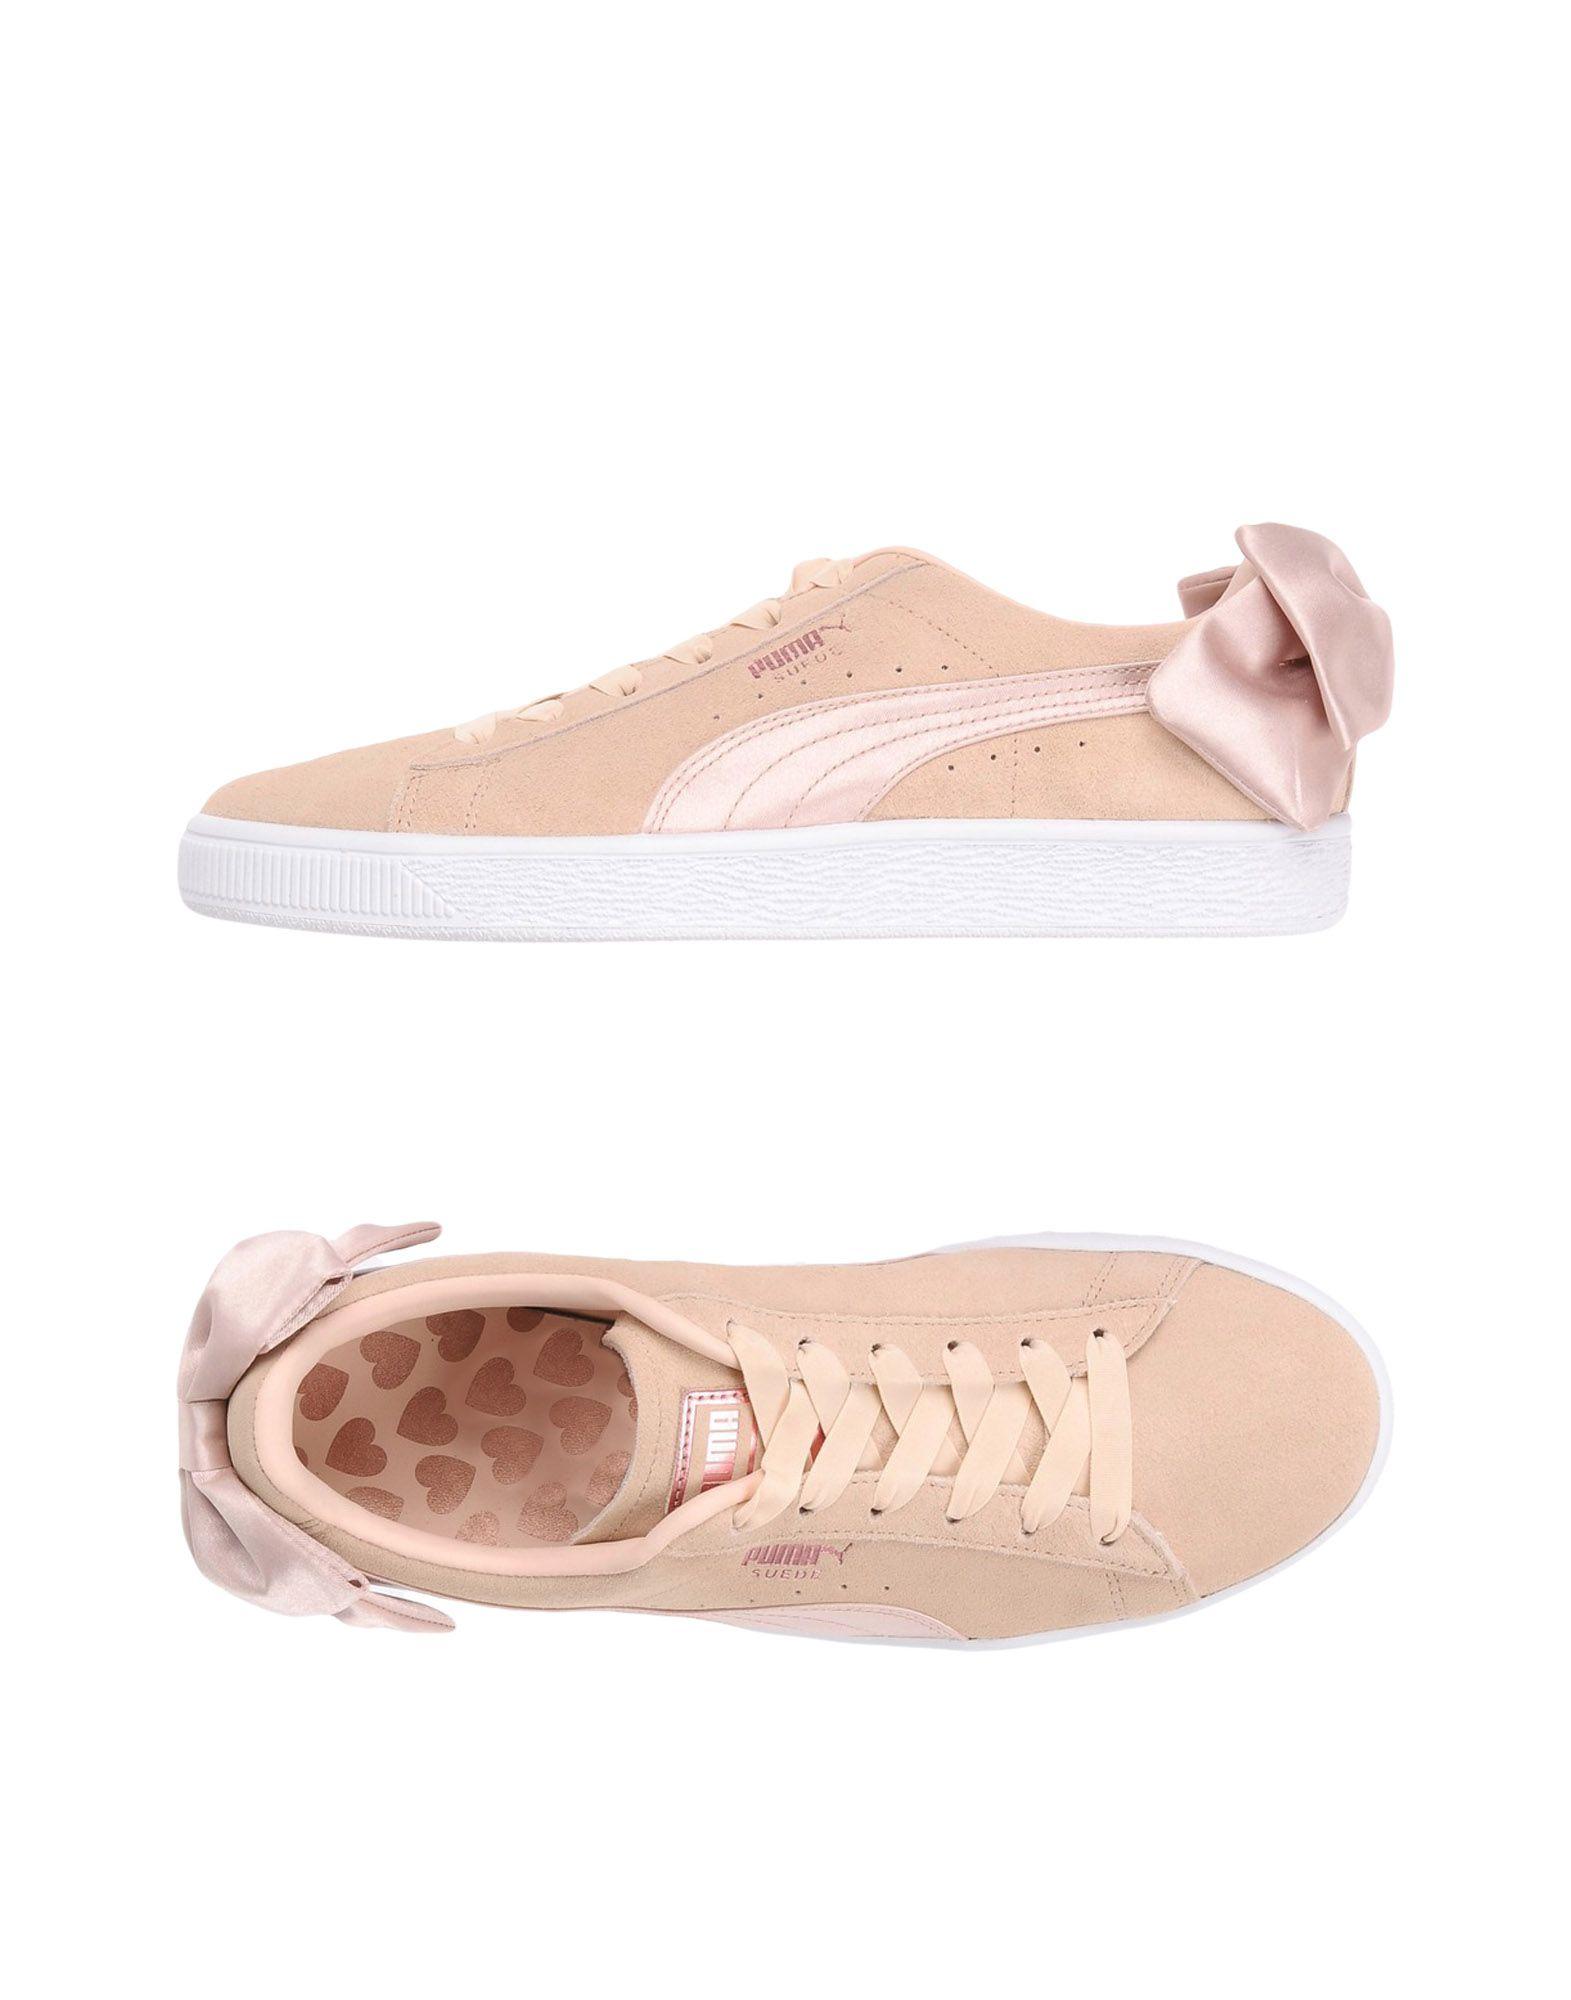 Sneakers Puma Suede Bow Valentine - Donna - Acquista online su